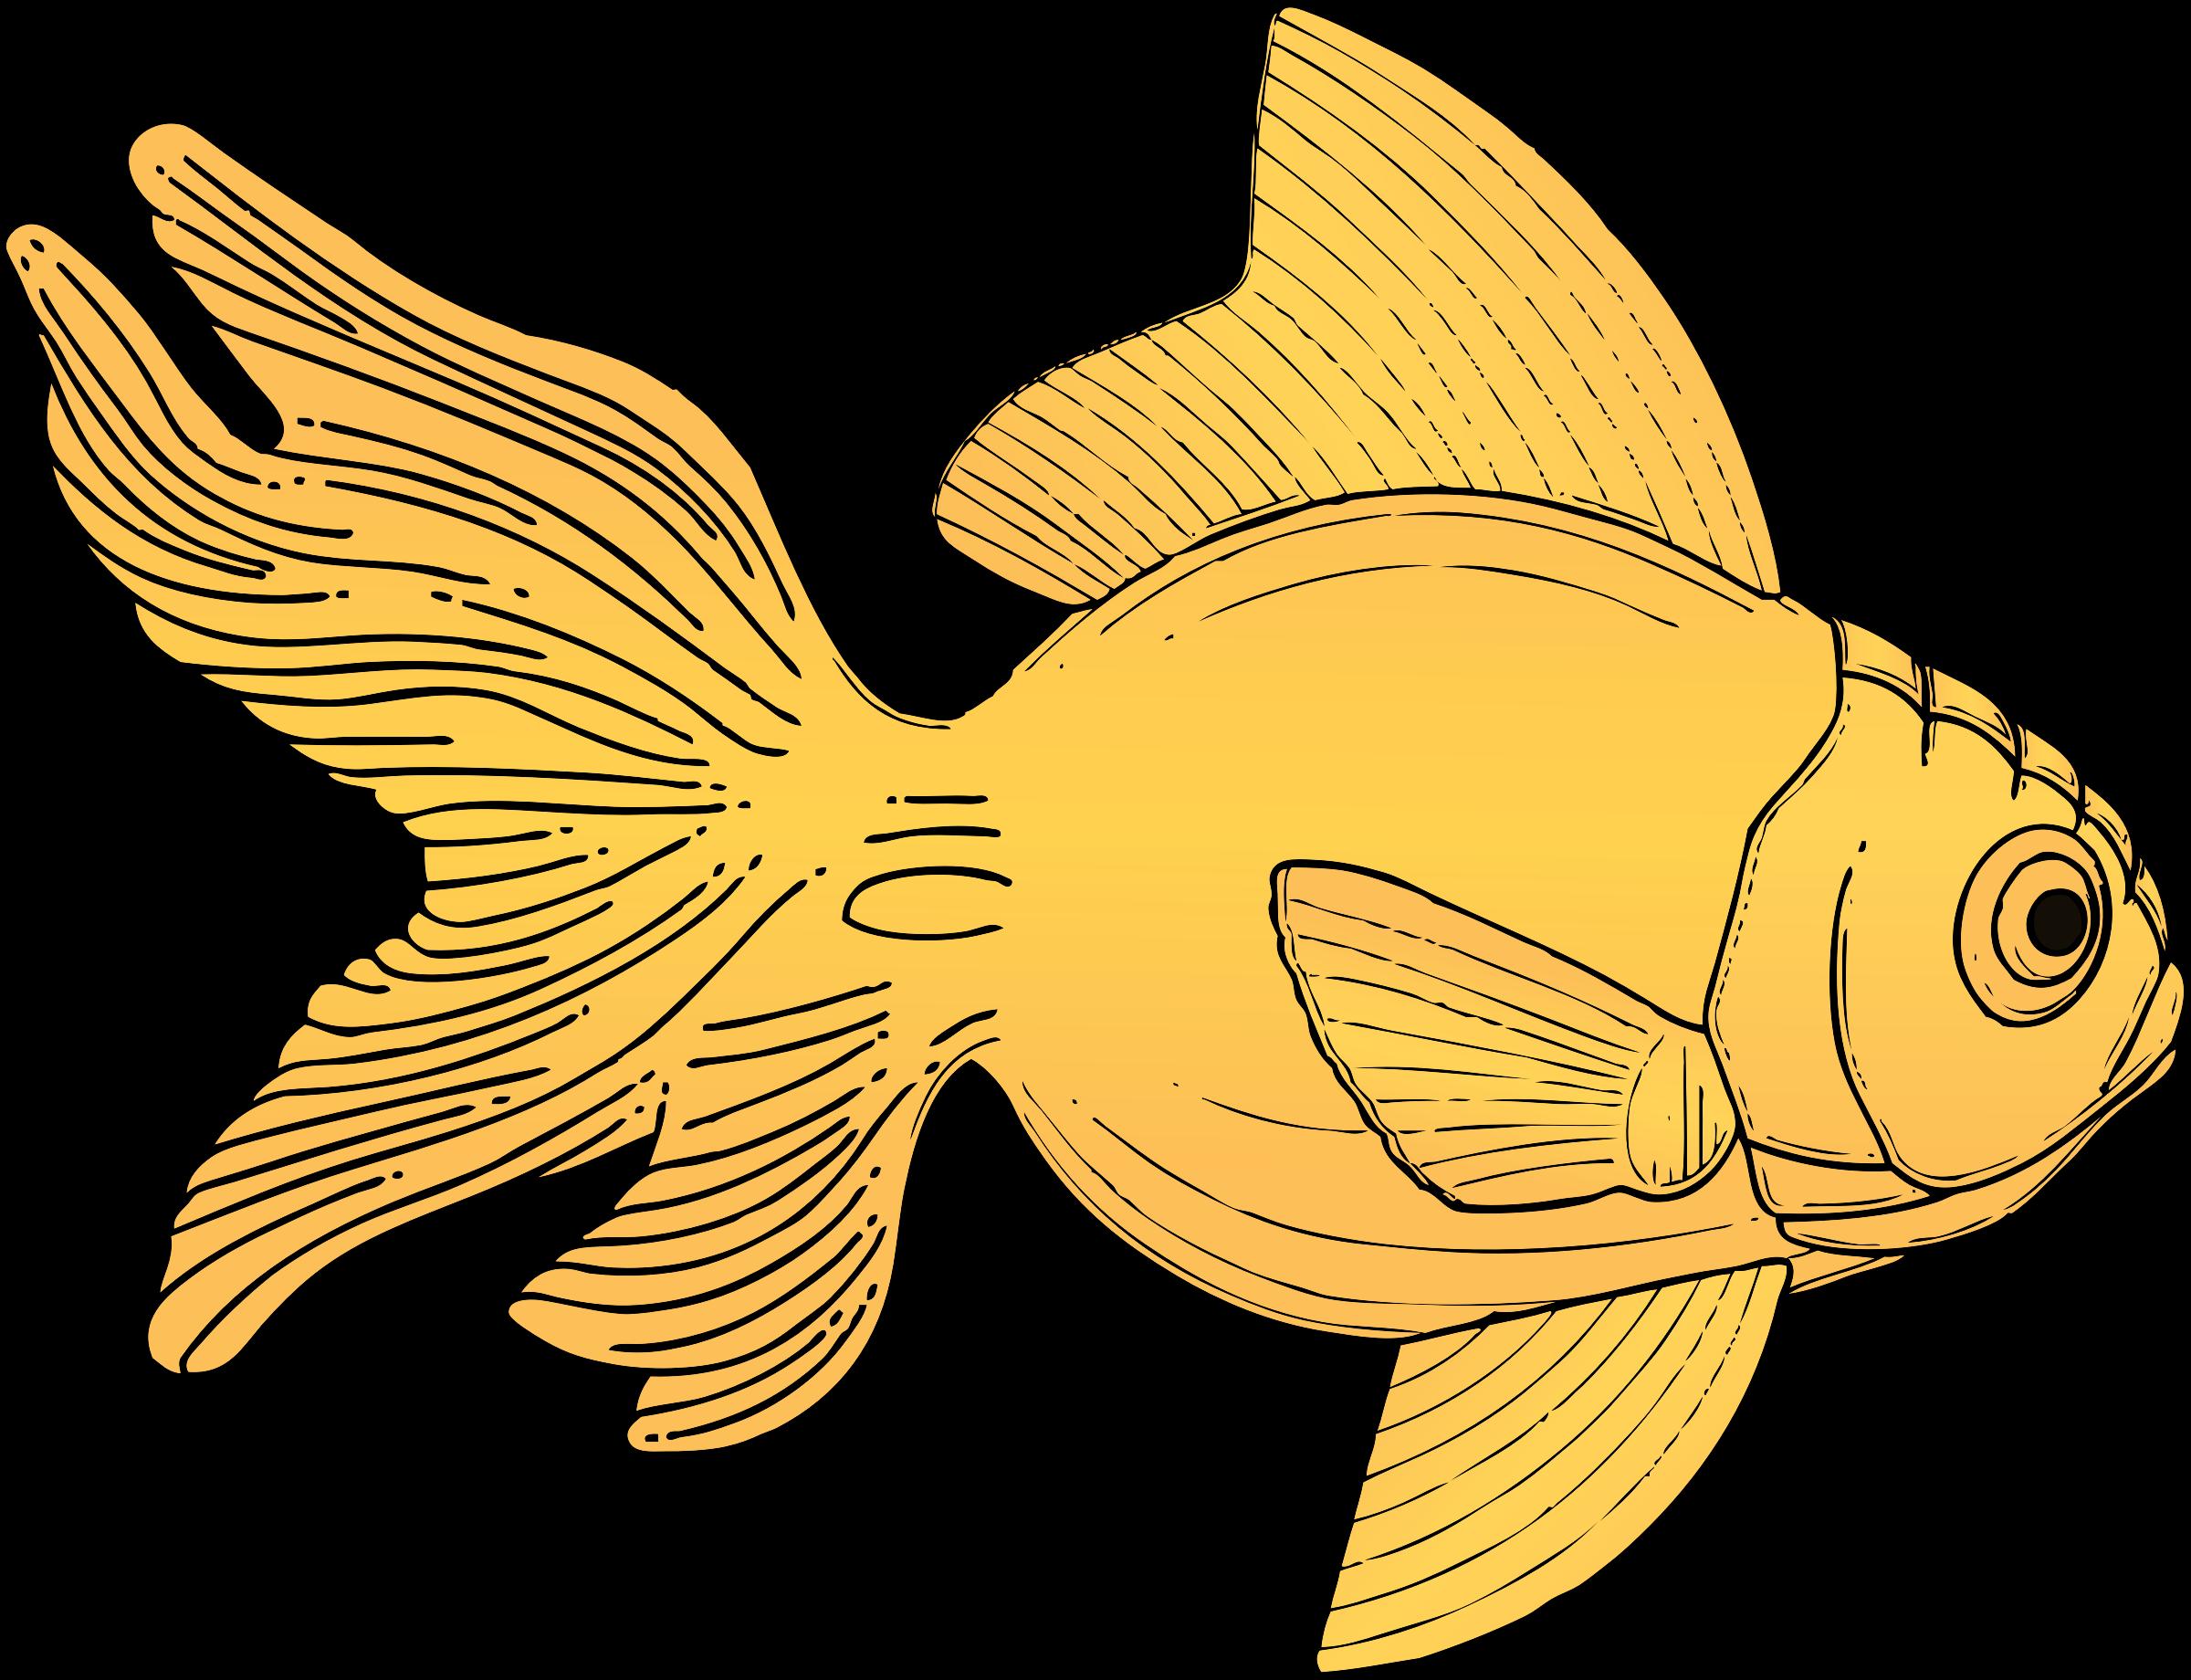 Pout pout fish clipart svg transparent download Amazing Fishing Boat Coloring Pages Photos - Coloring Page ... svg transparent download